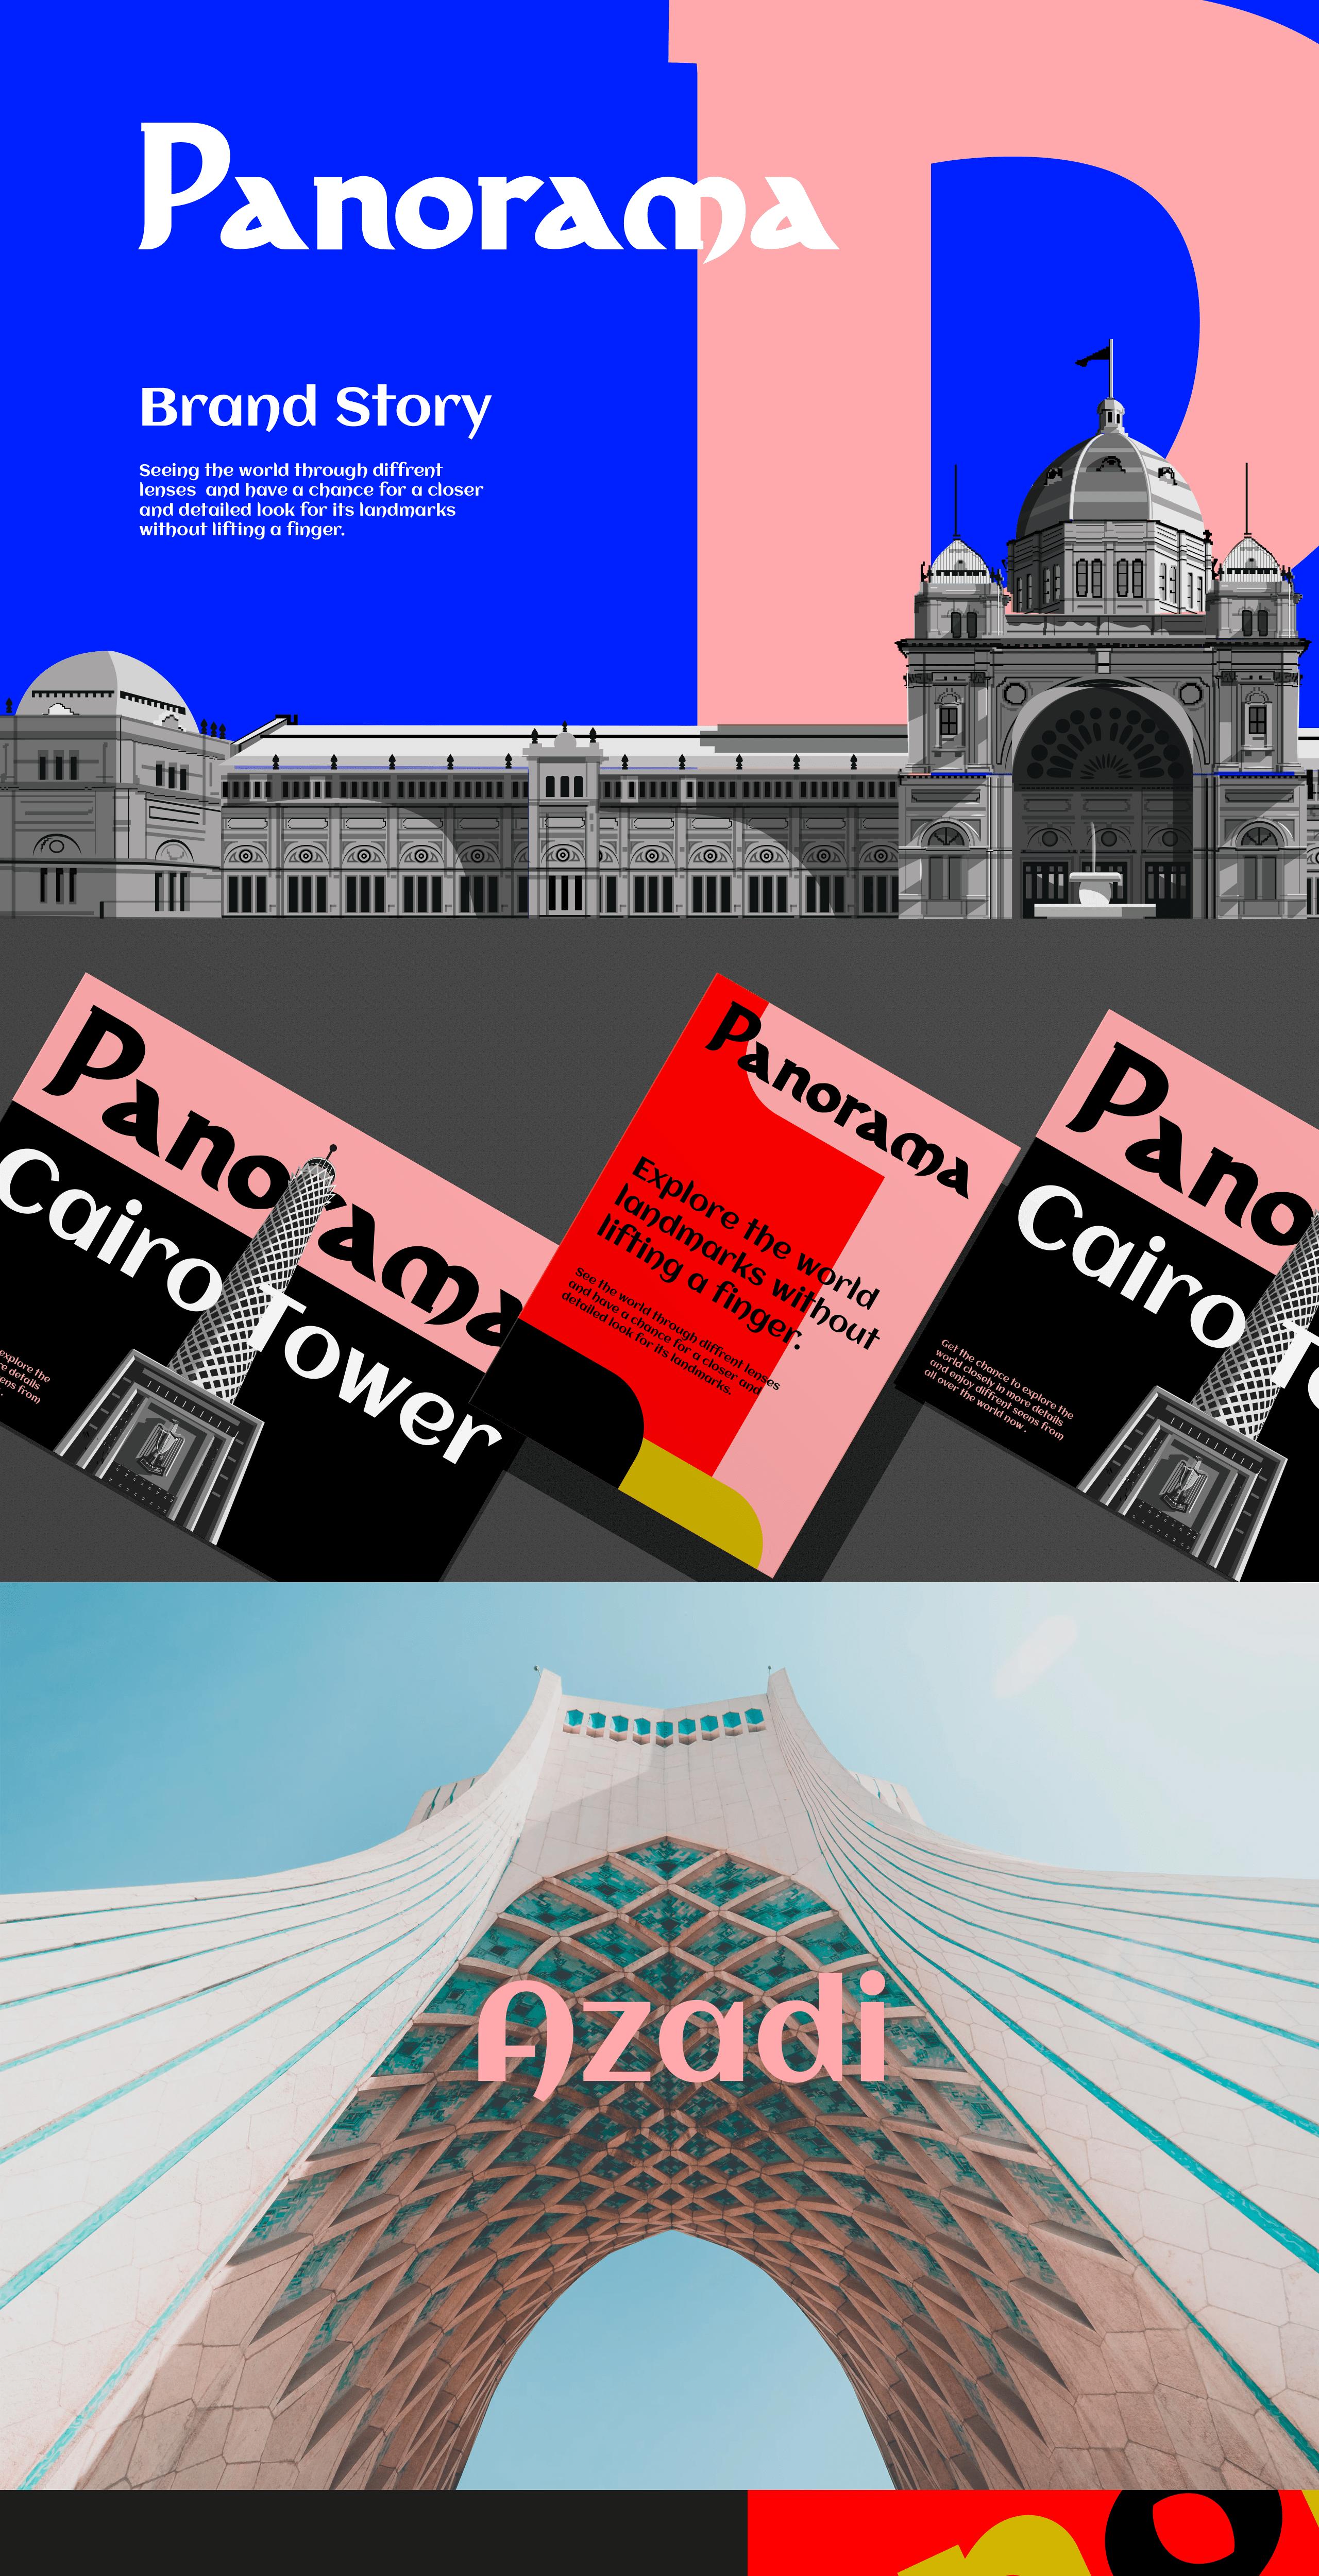 Panorama landmarks